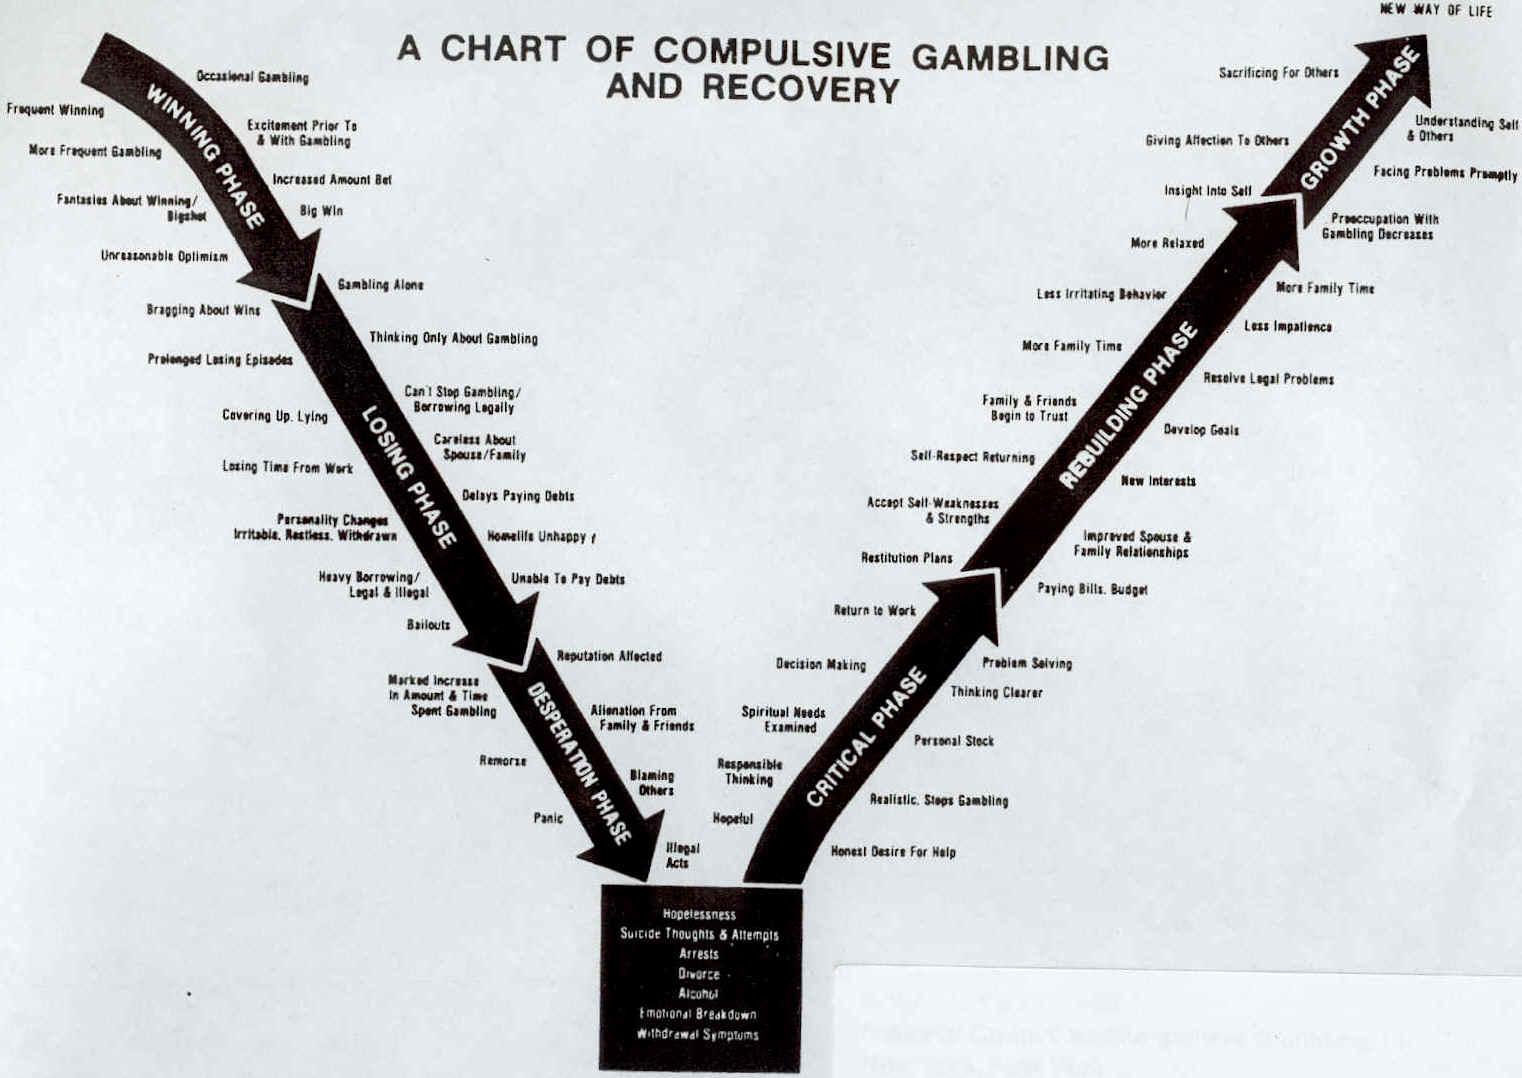 Gambling addiction chart nashville tn casinos and gambling